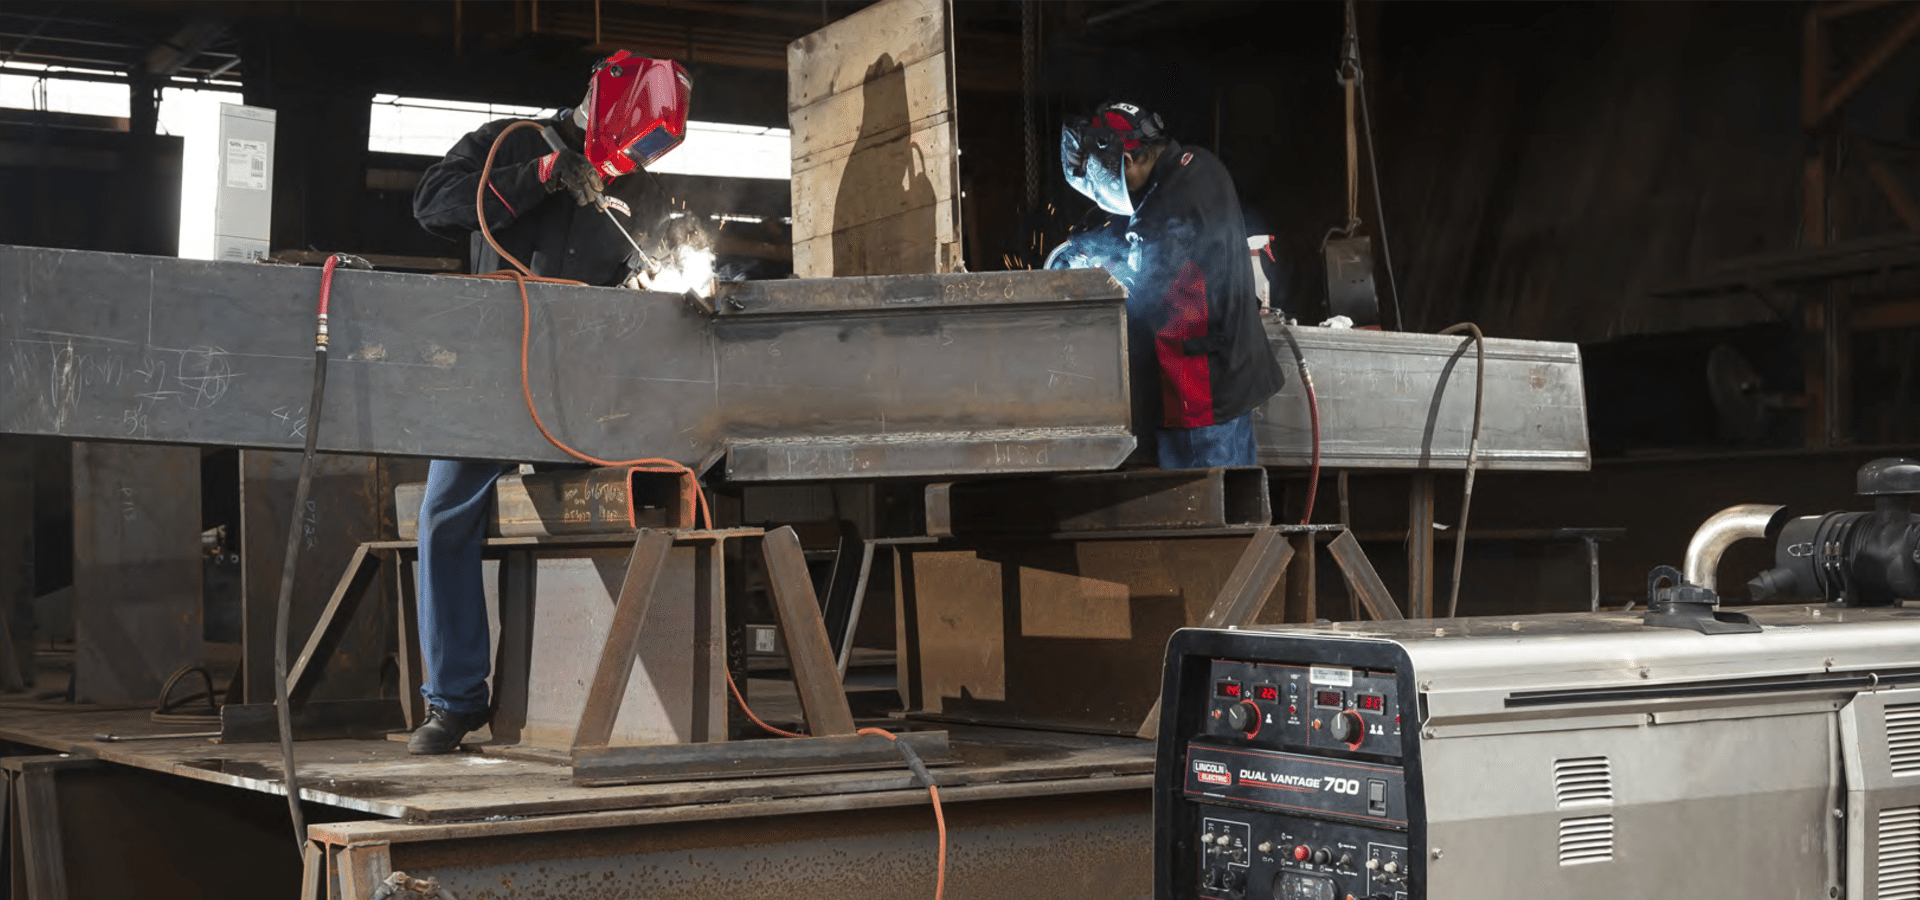 Lincoln Electric Nz Welder Supplies Invertec 275 Parts